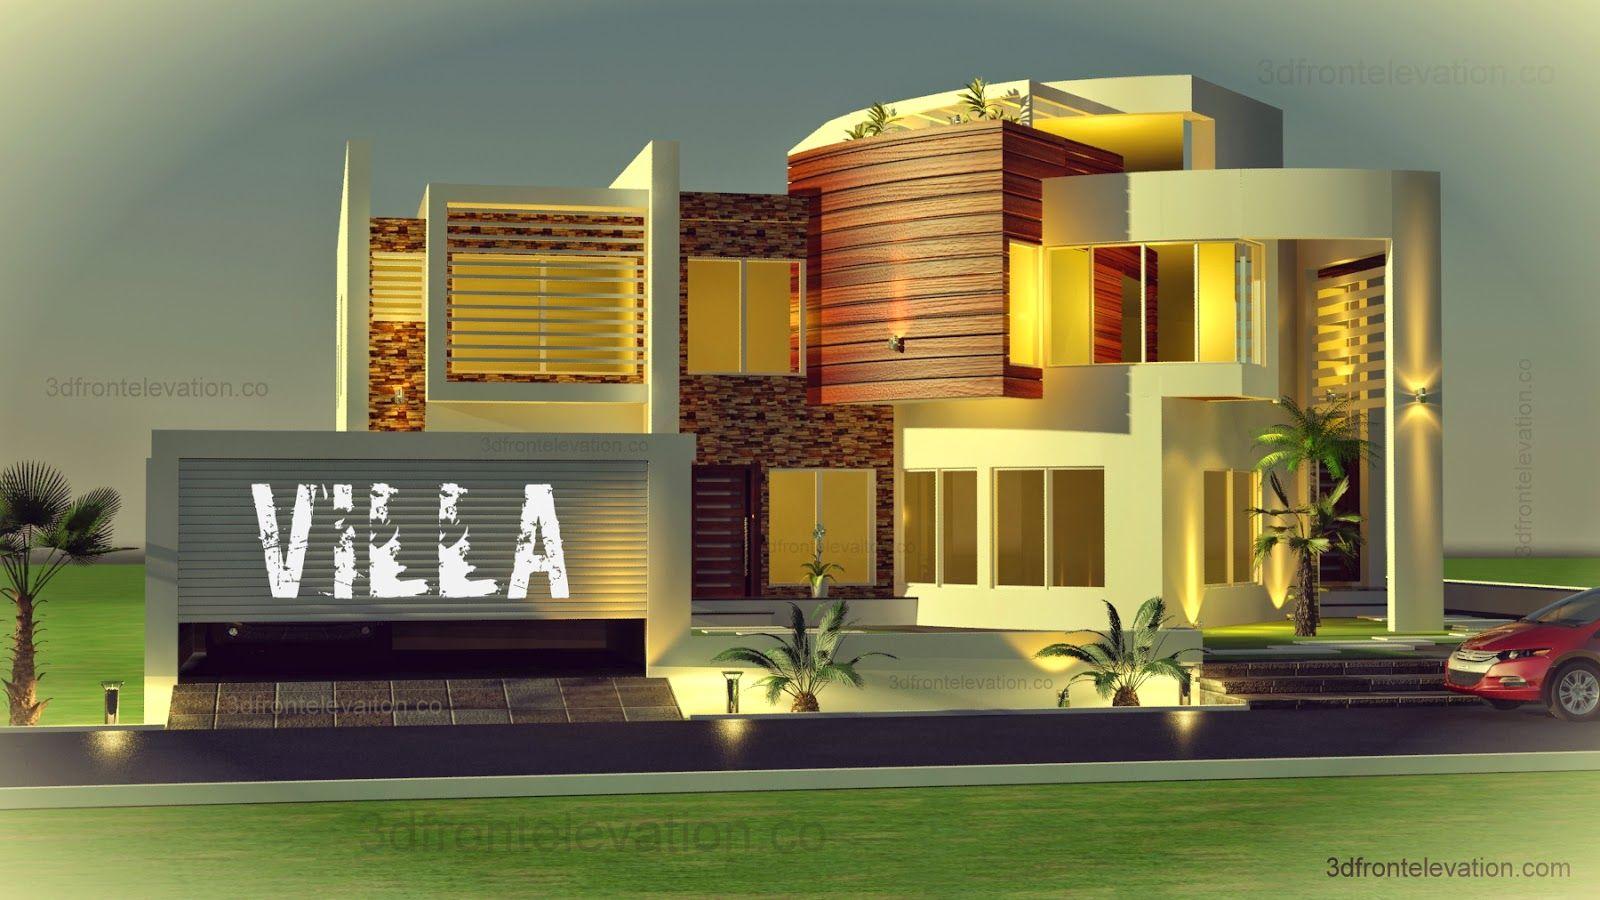 Front Elevation Villas Dubai : D front elevation oman modern contemporary villa